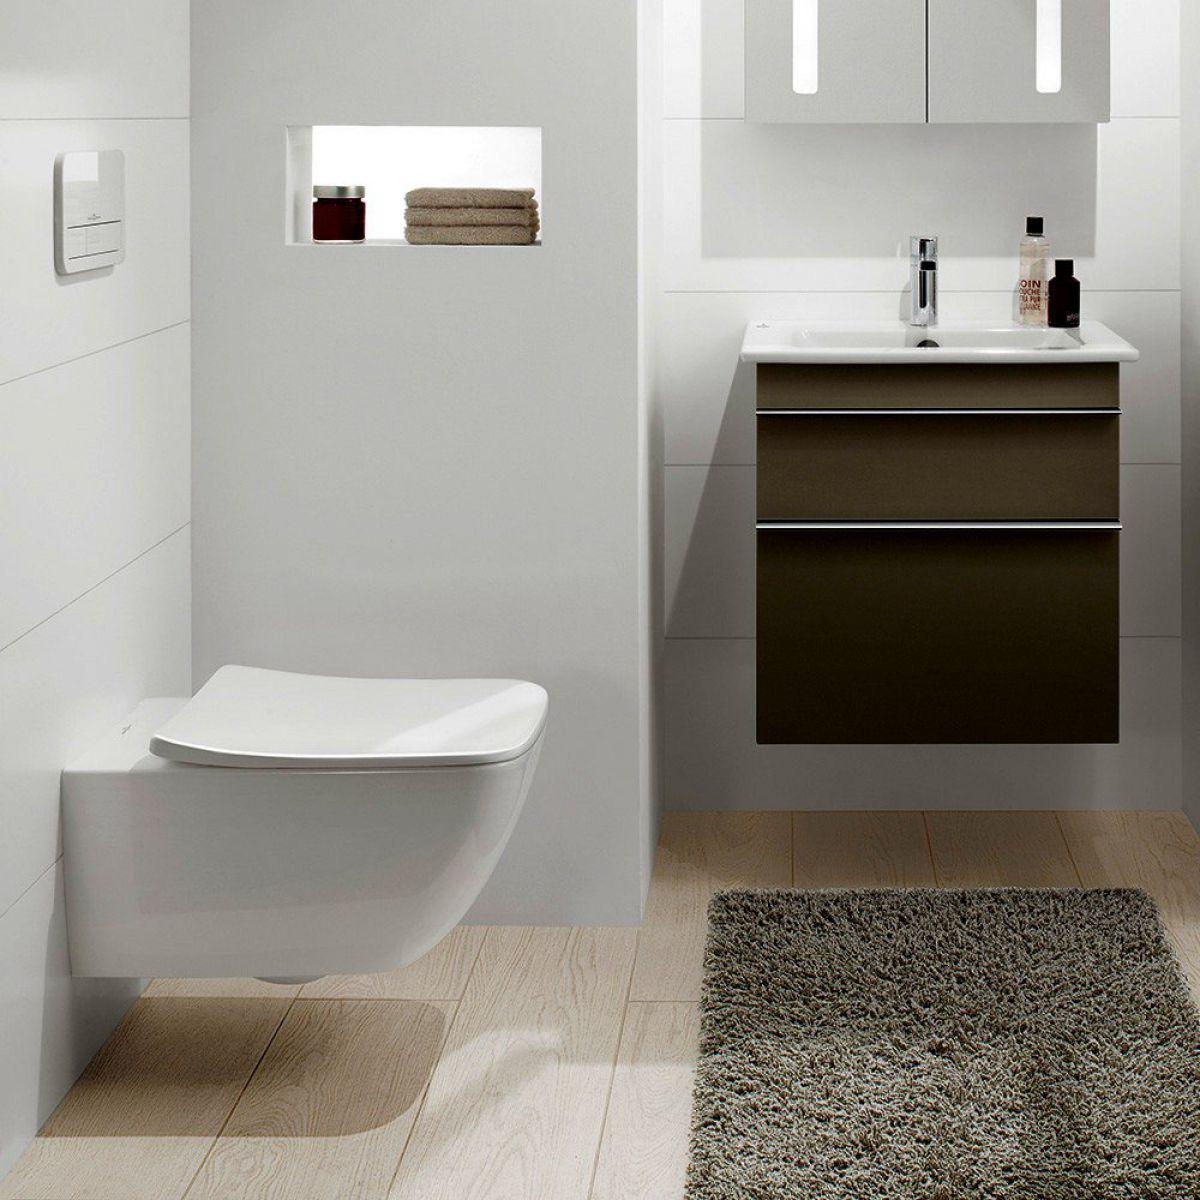 villeroy boch venticello rimless wall hung toilet uk bathrooms. Black Bedroom Furniture Sets. Home Design Ideas